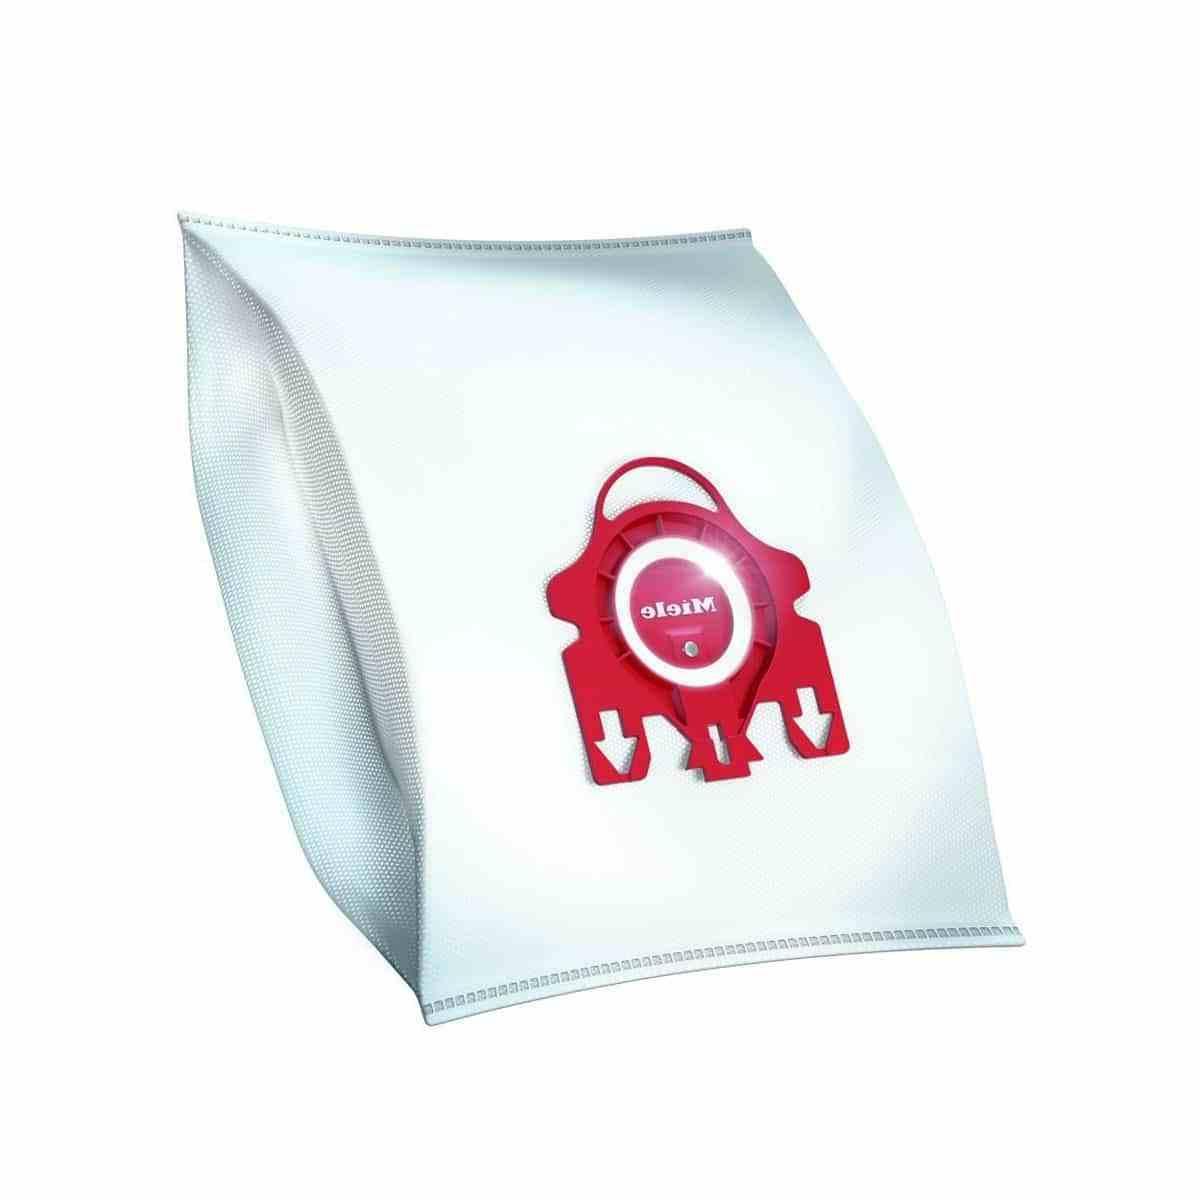 Miele Pure Compact Canister Vacuum | Authorized Miele